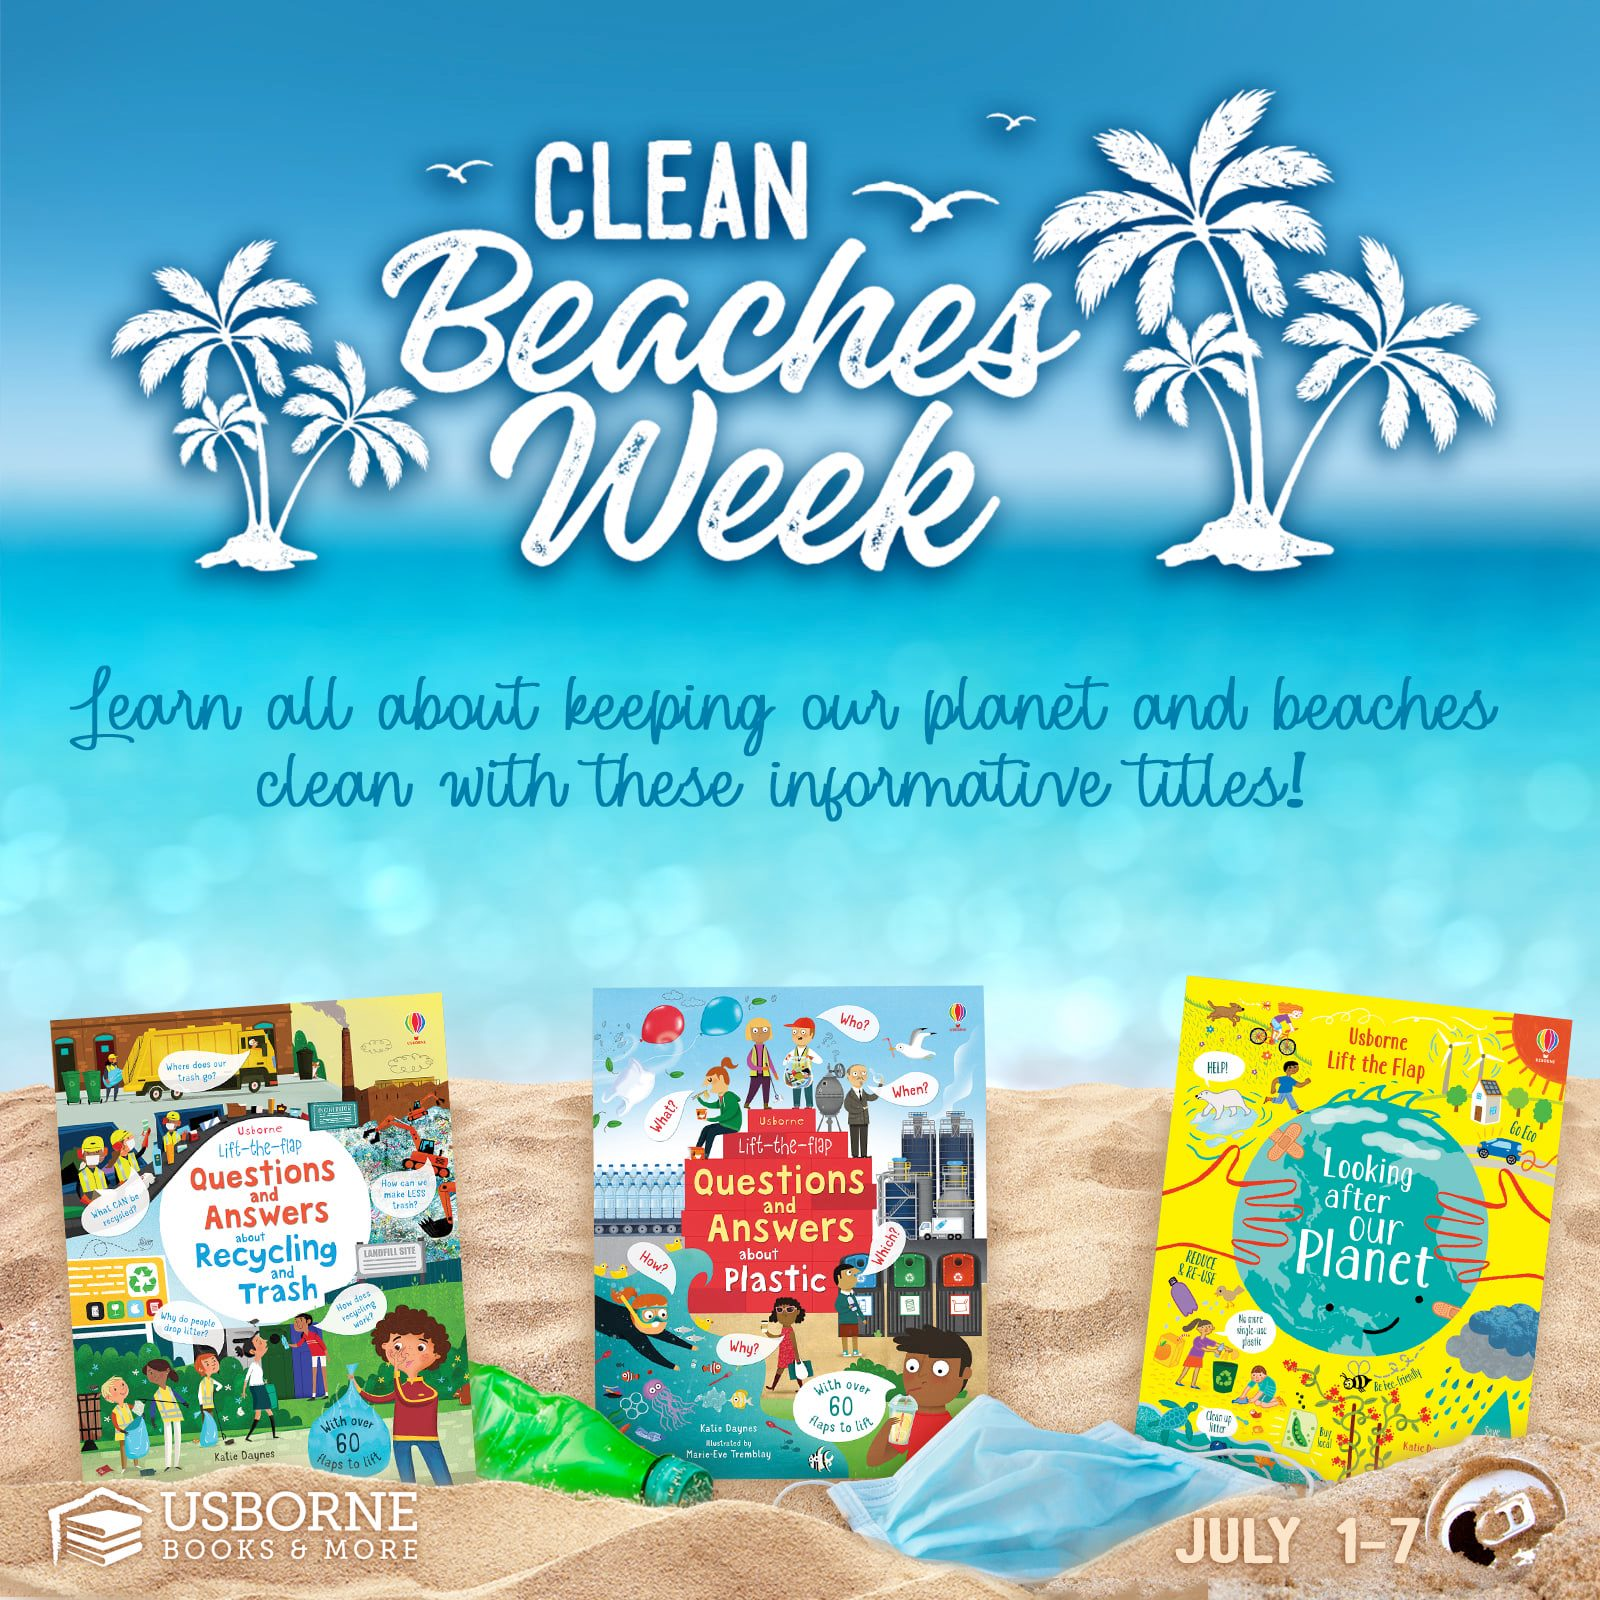 Clean Beaches Week ~ July 1-7